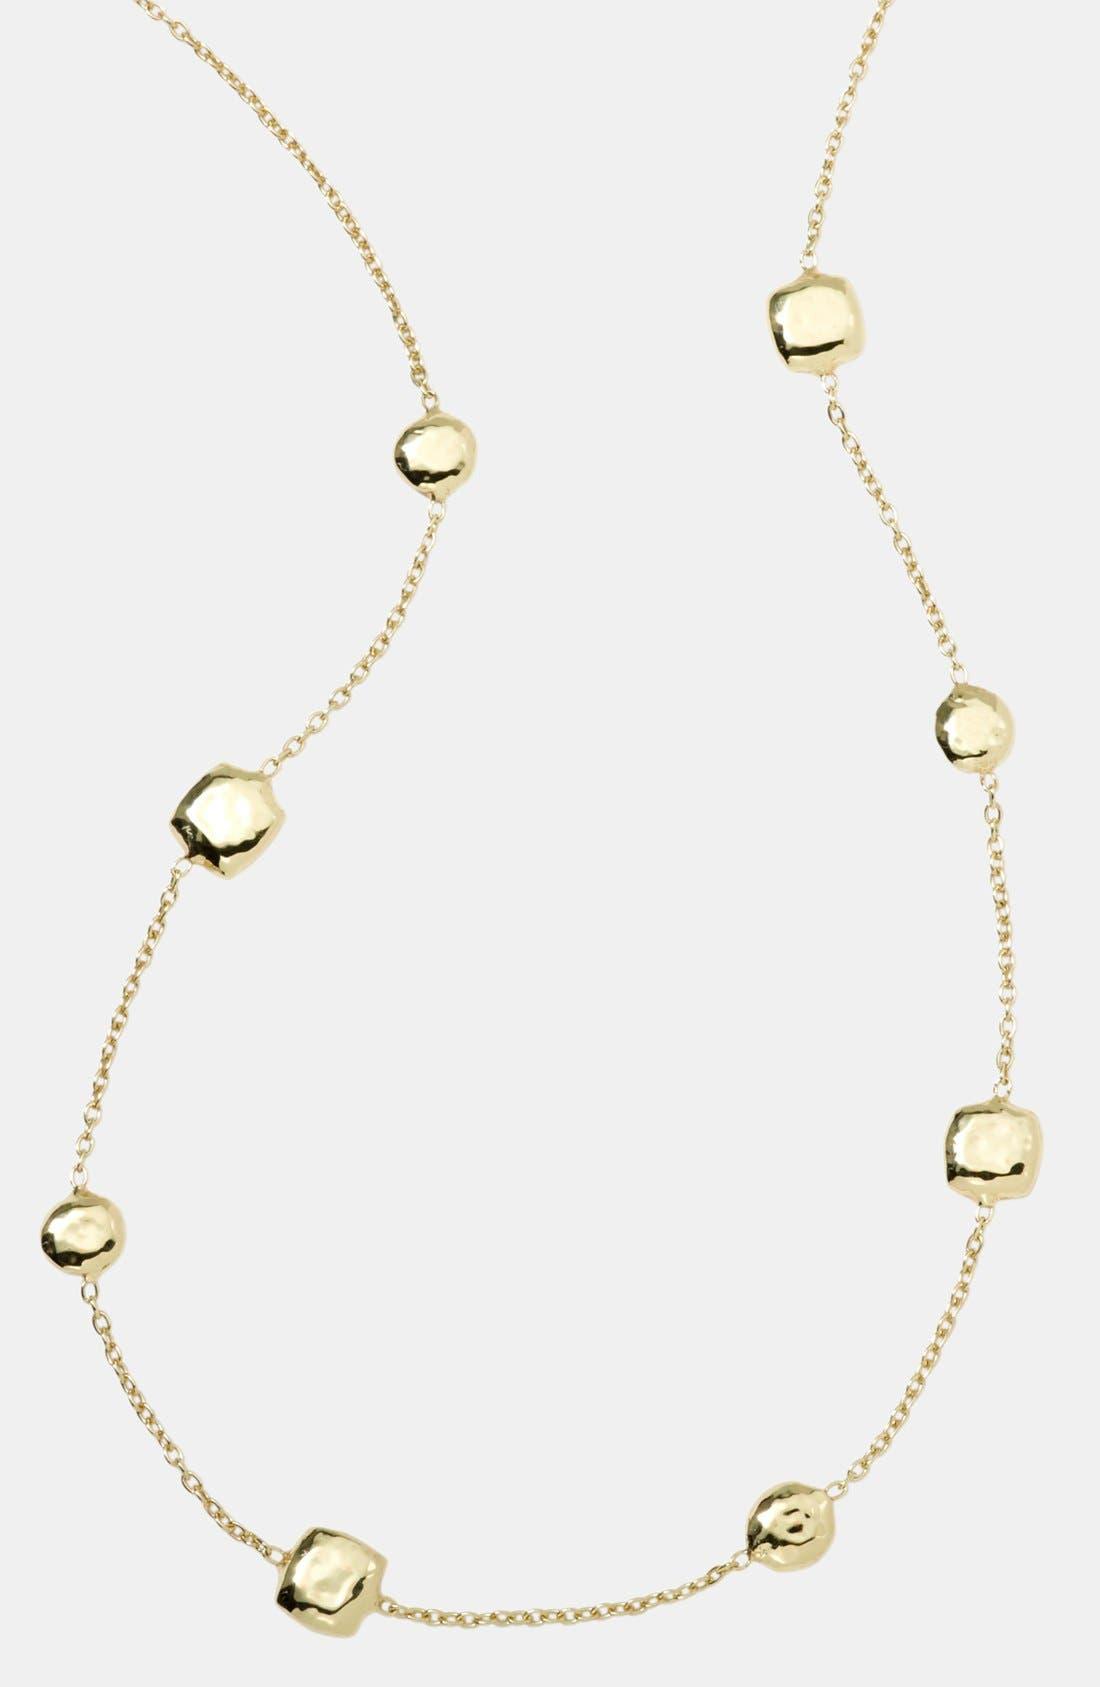 Alternate Image 1 Selected - Ippolita 'Glamazon' 18k Gold Station Necklace